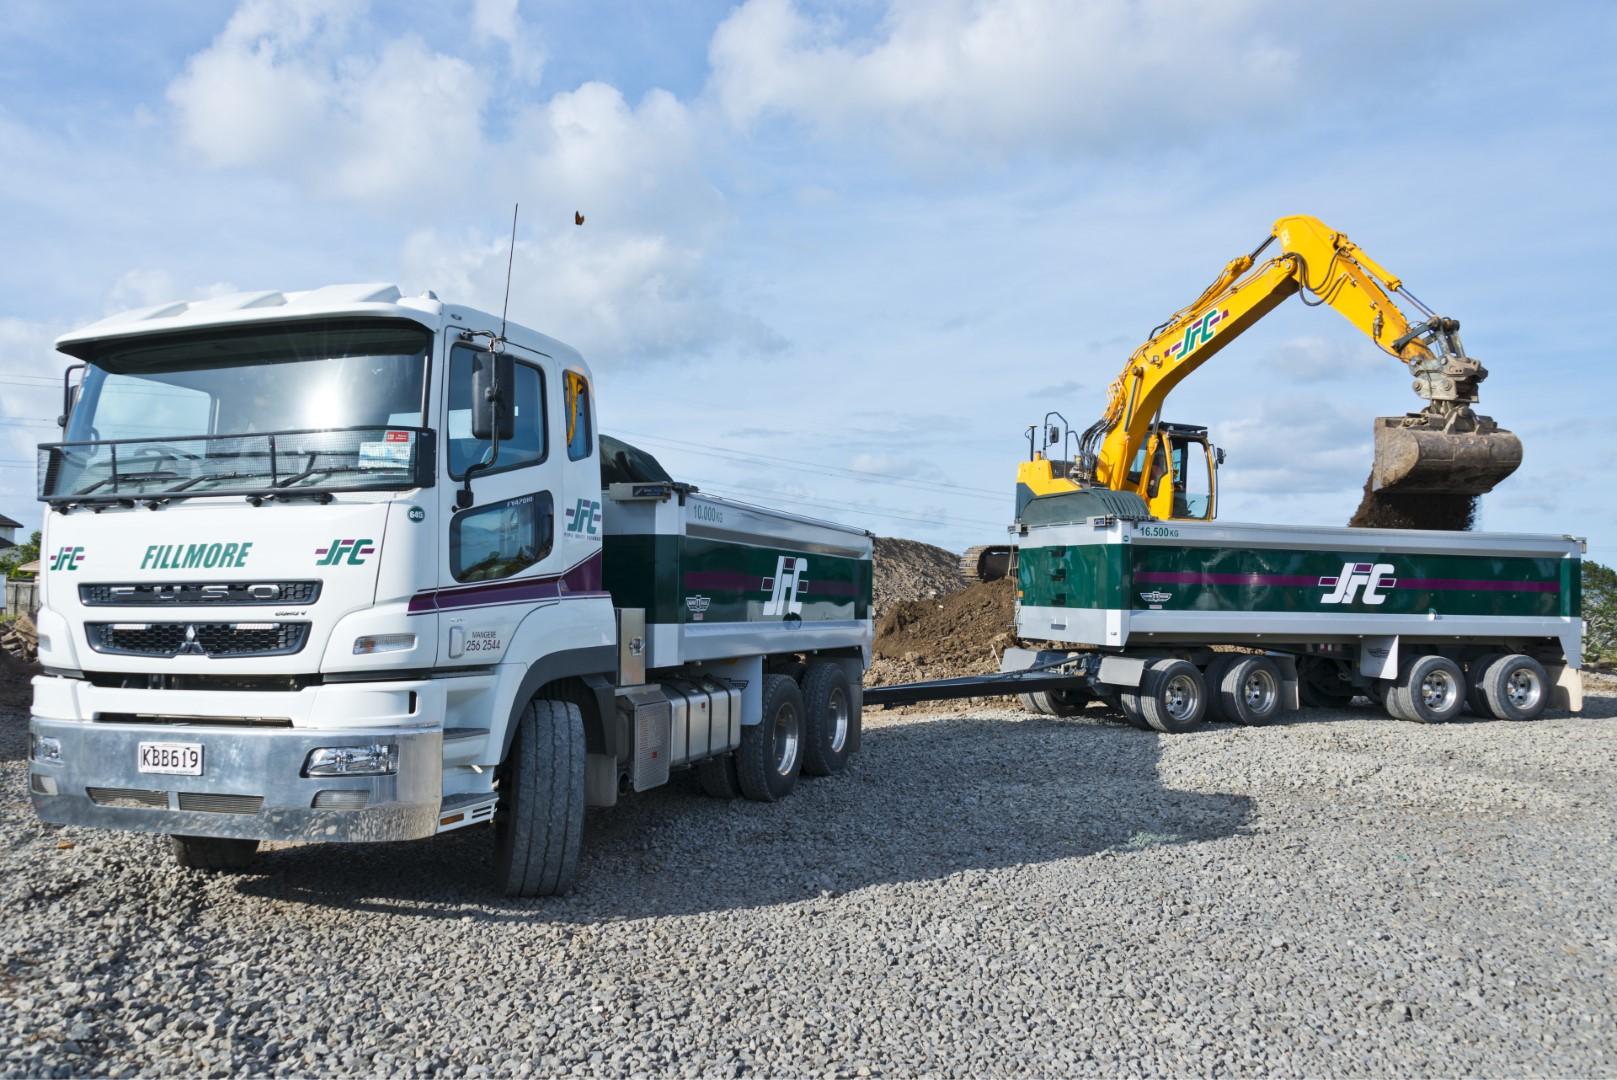 JFC transport truck and digger